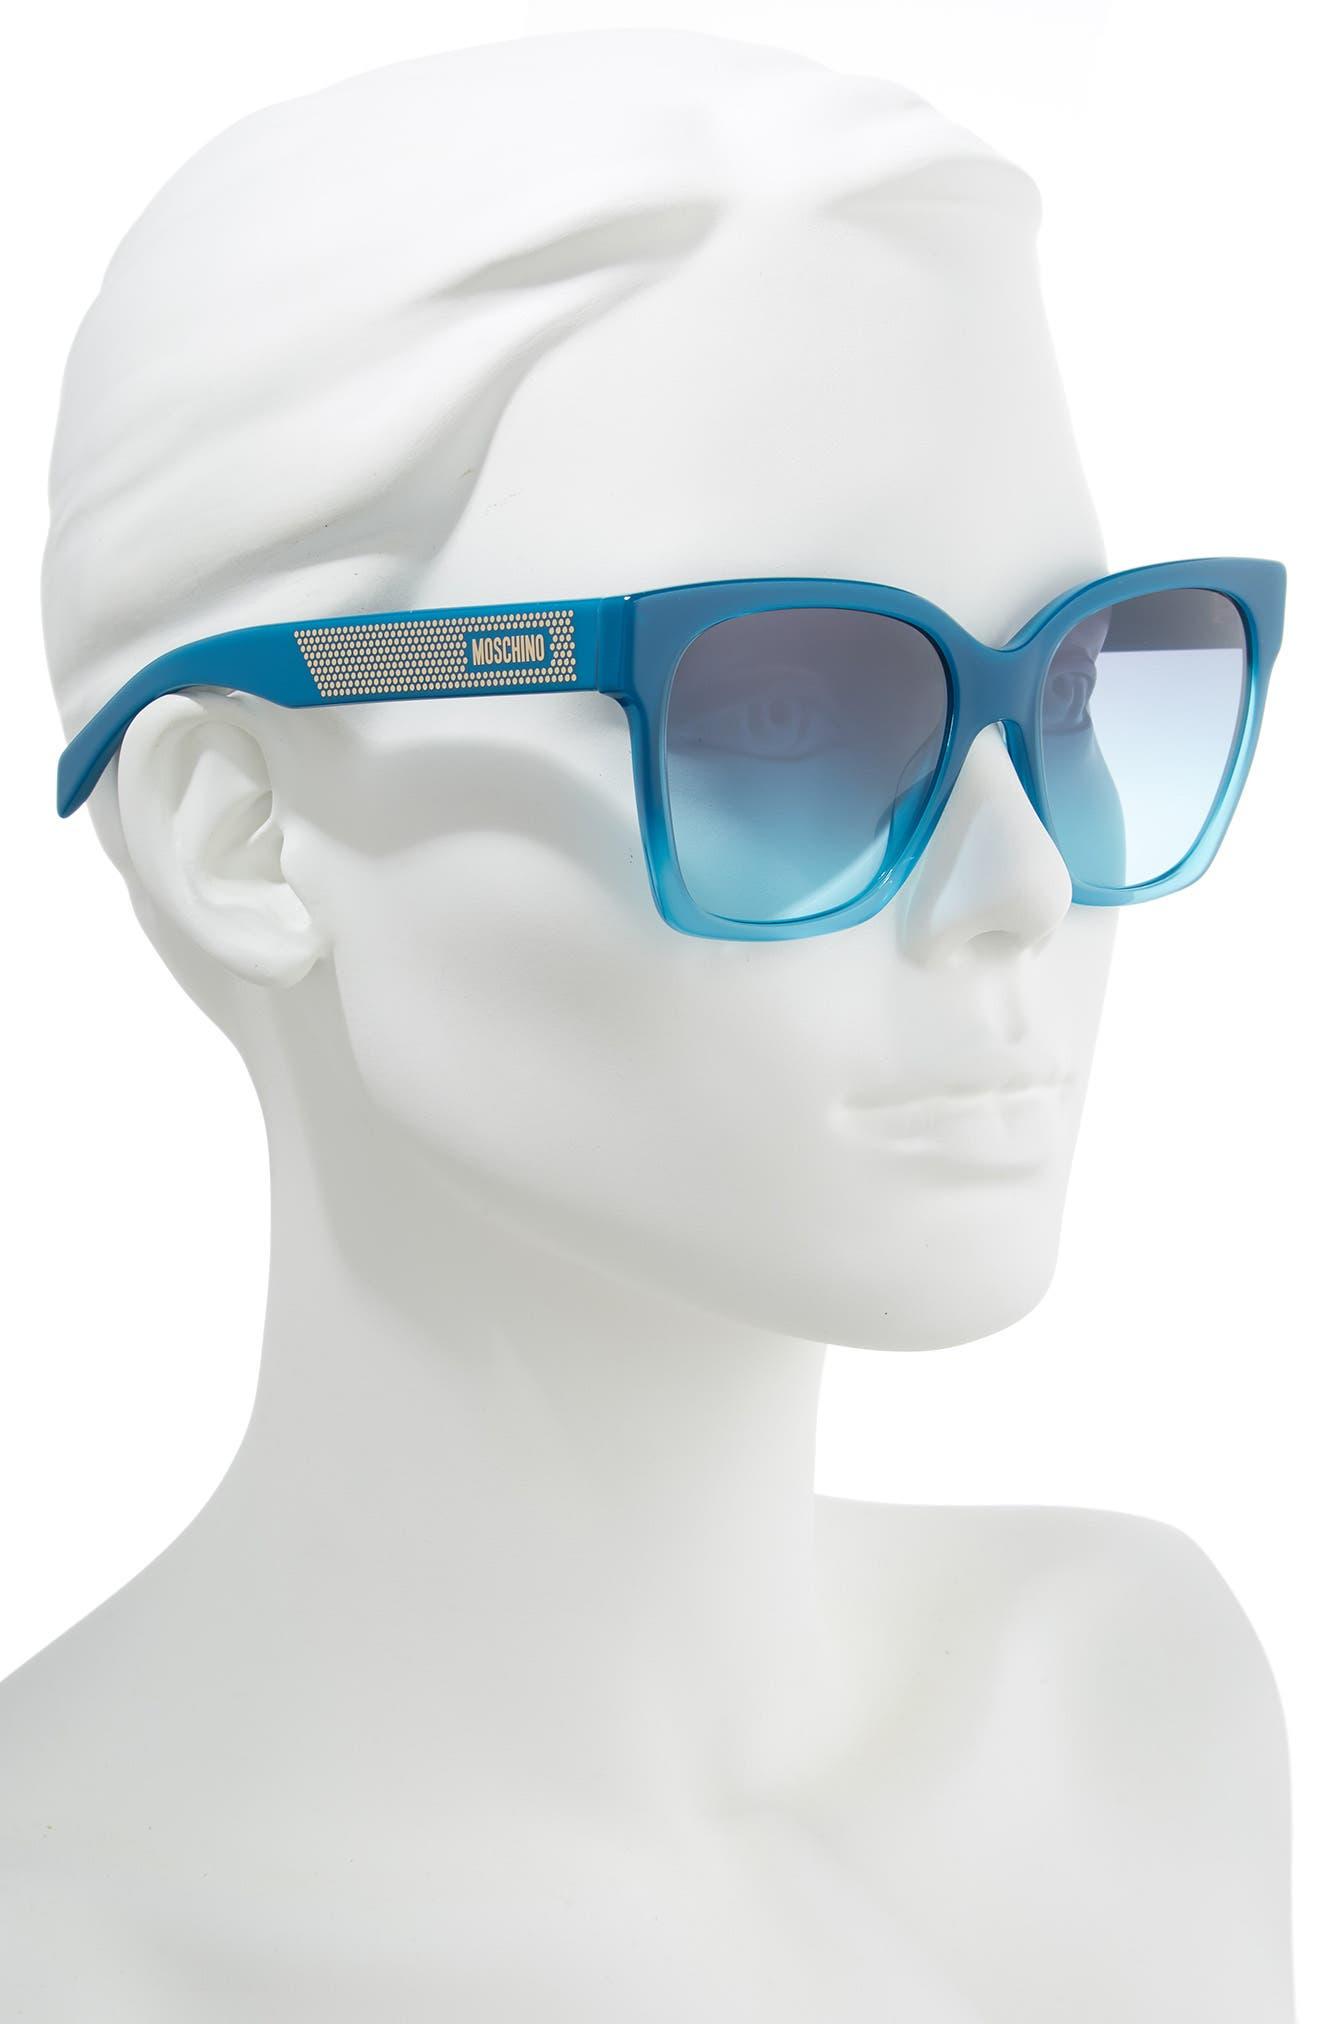 MOSCHINO, 56mm Sunglasses, Alternate thumbnail 2, color, TEAL TEA